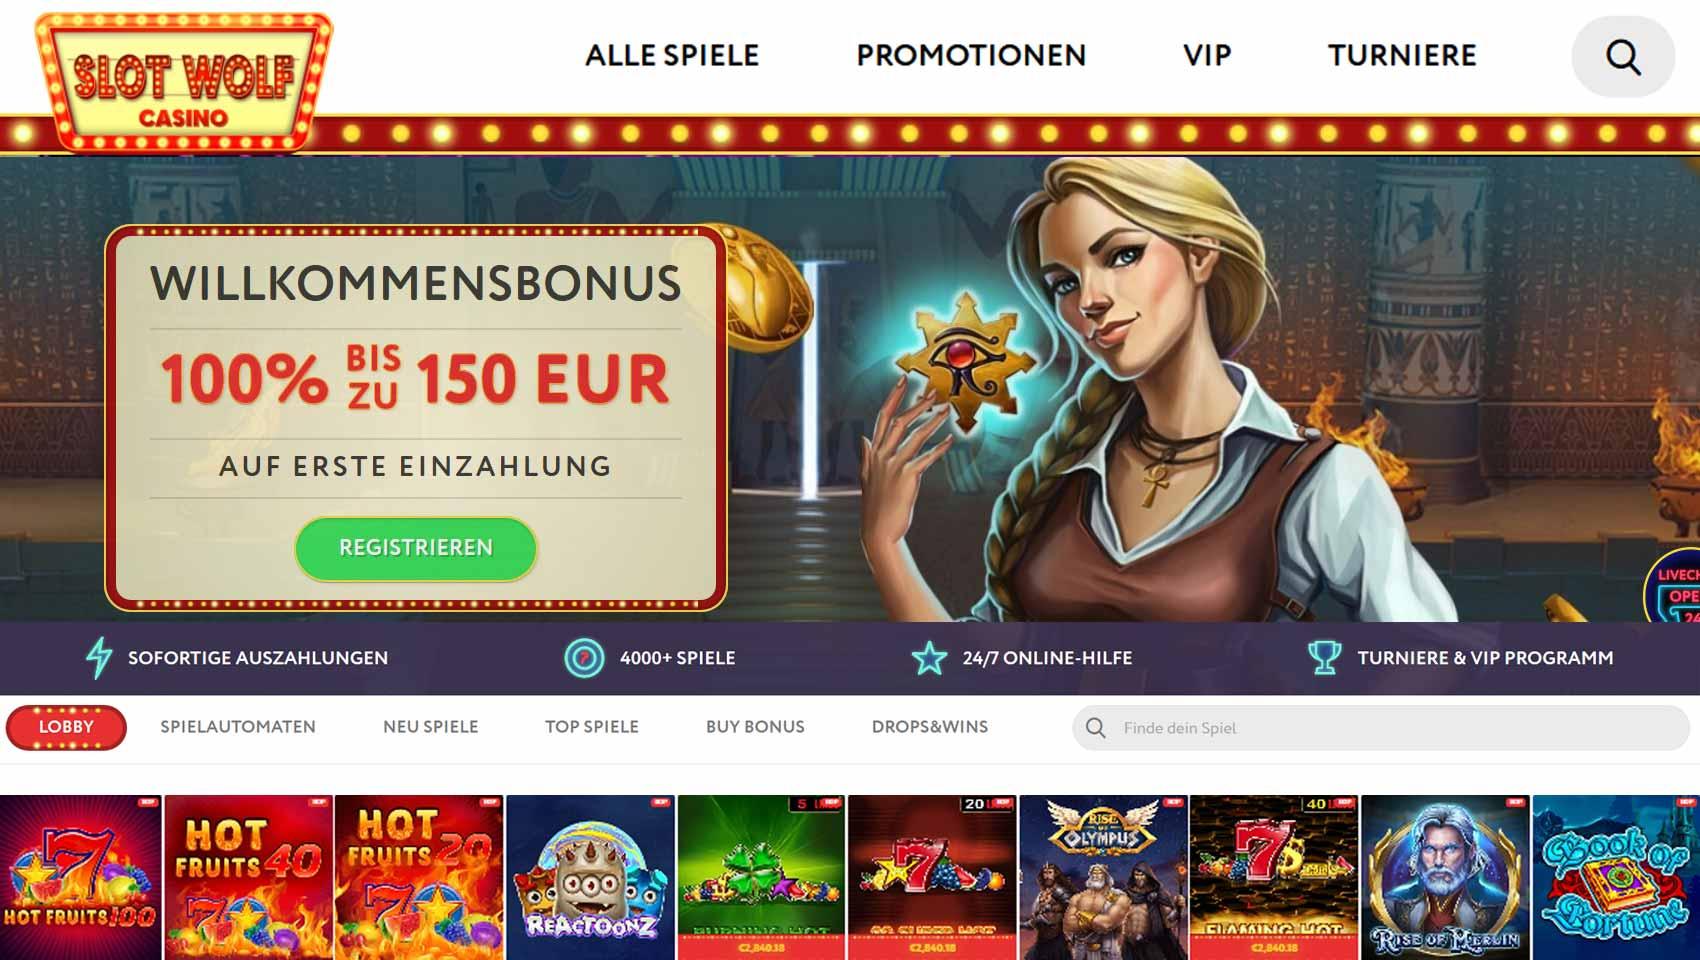 Stargames real money